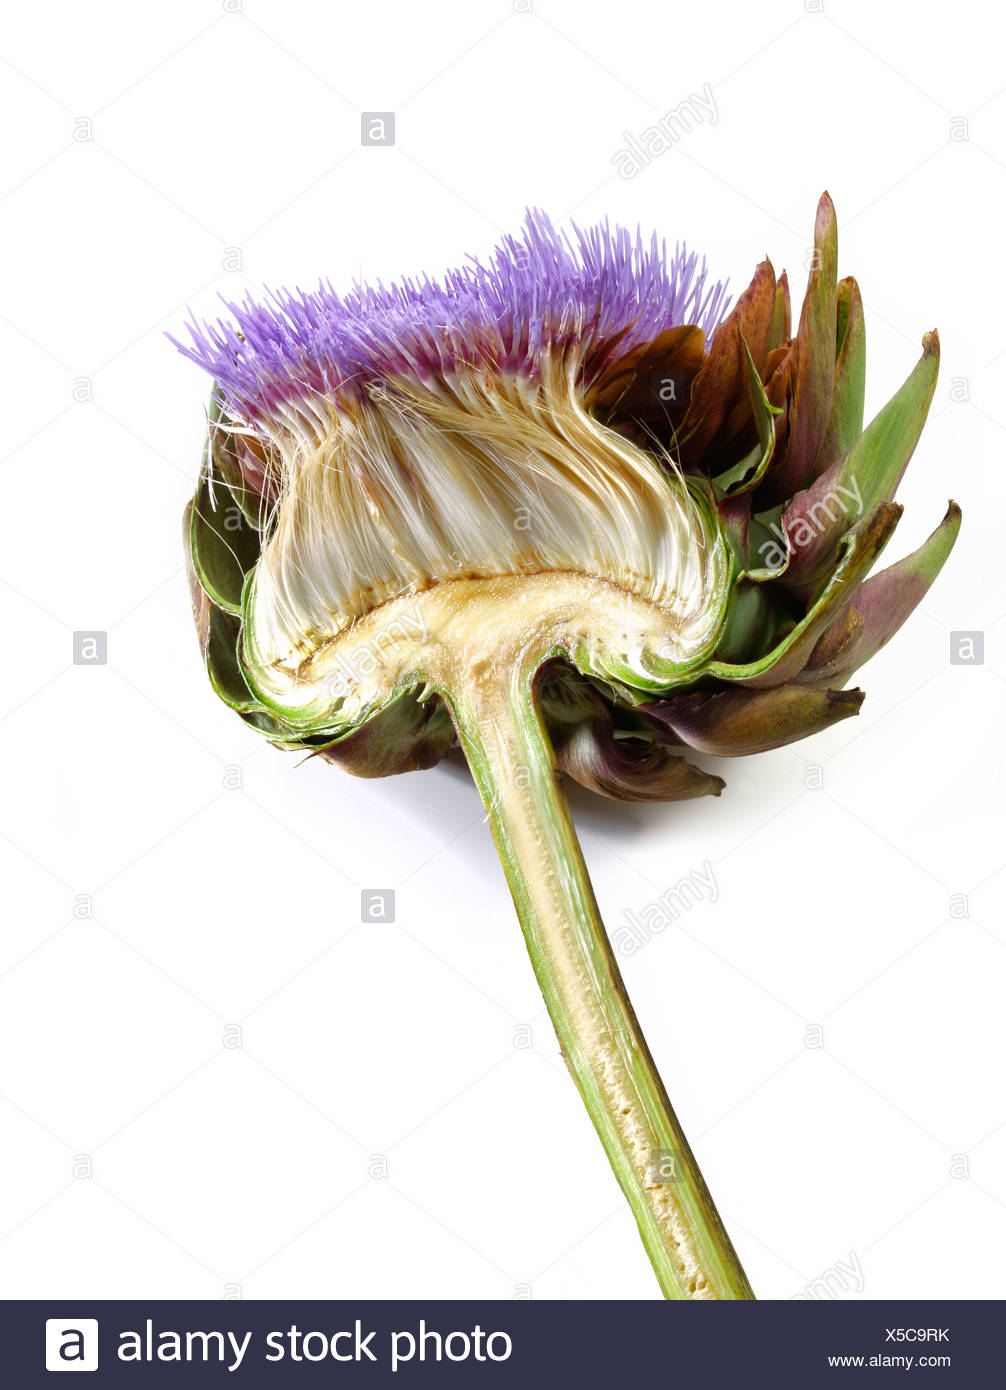 Halved flower of a Cardoon or Artichoke Thistle (Cynara cardunculus, Cynara scolymus) - Stock Image